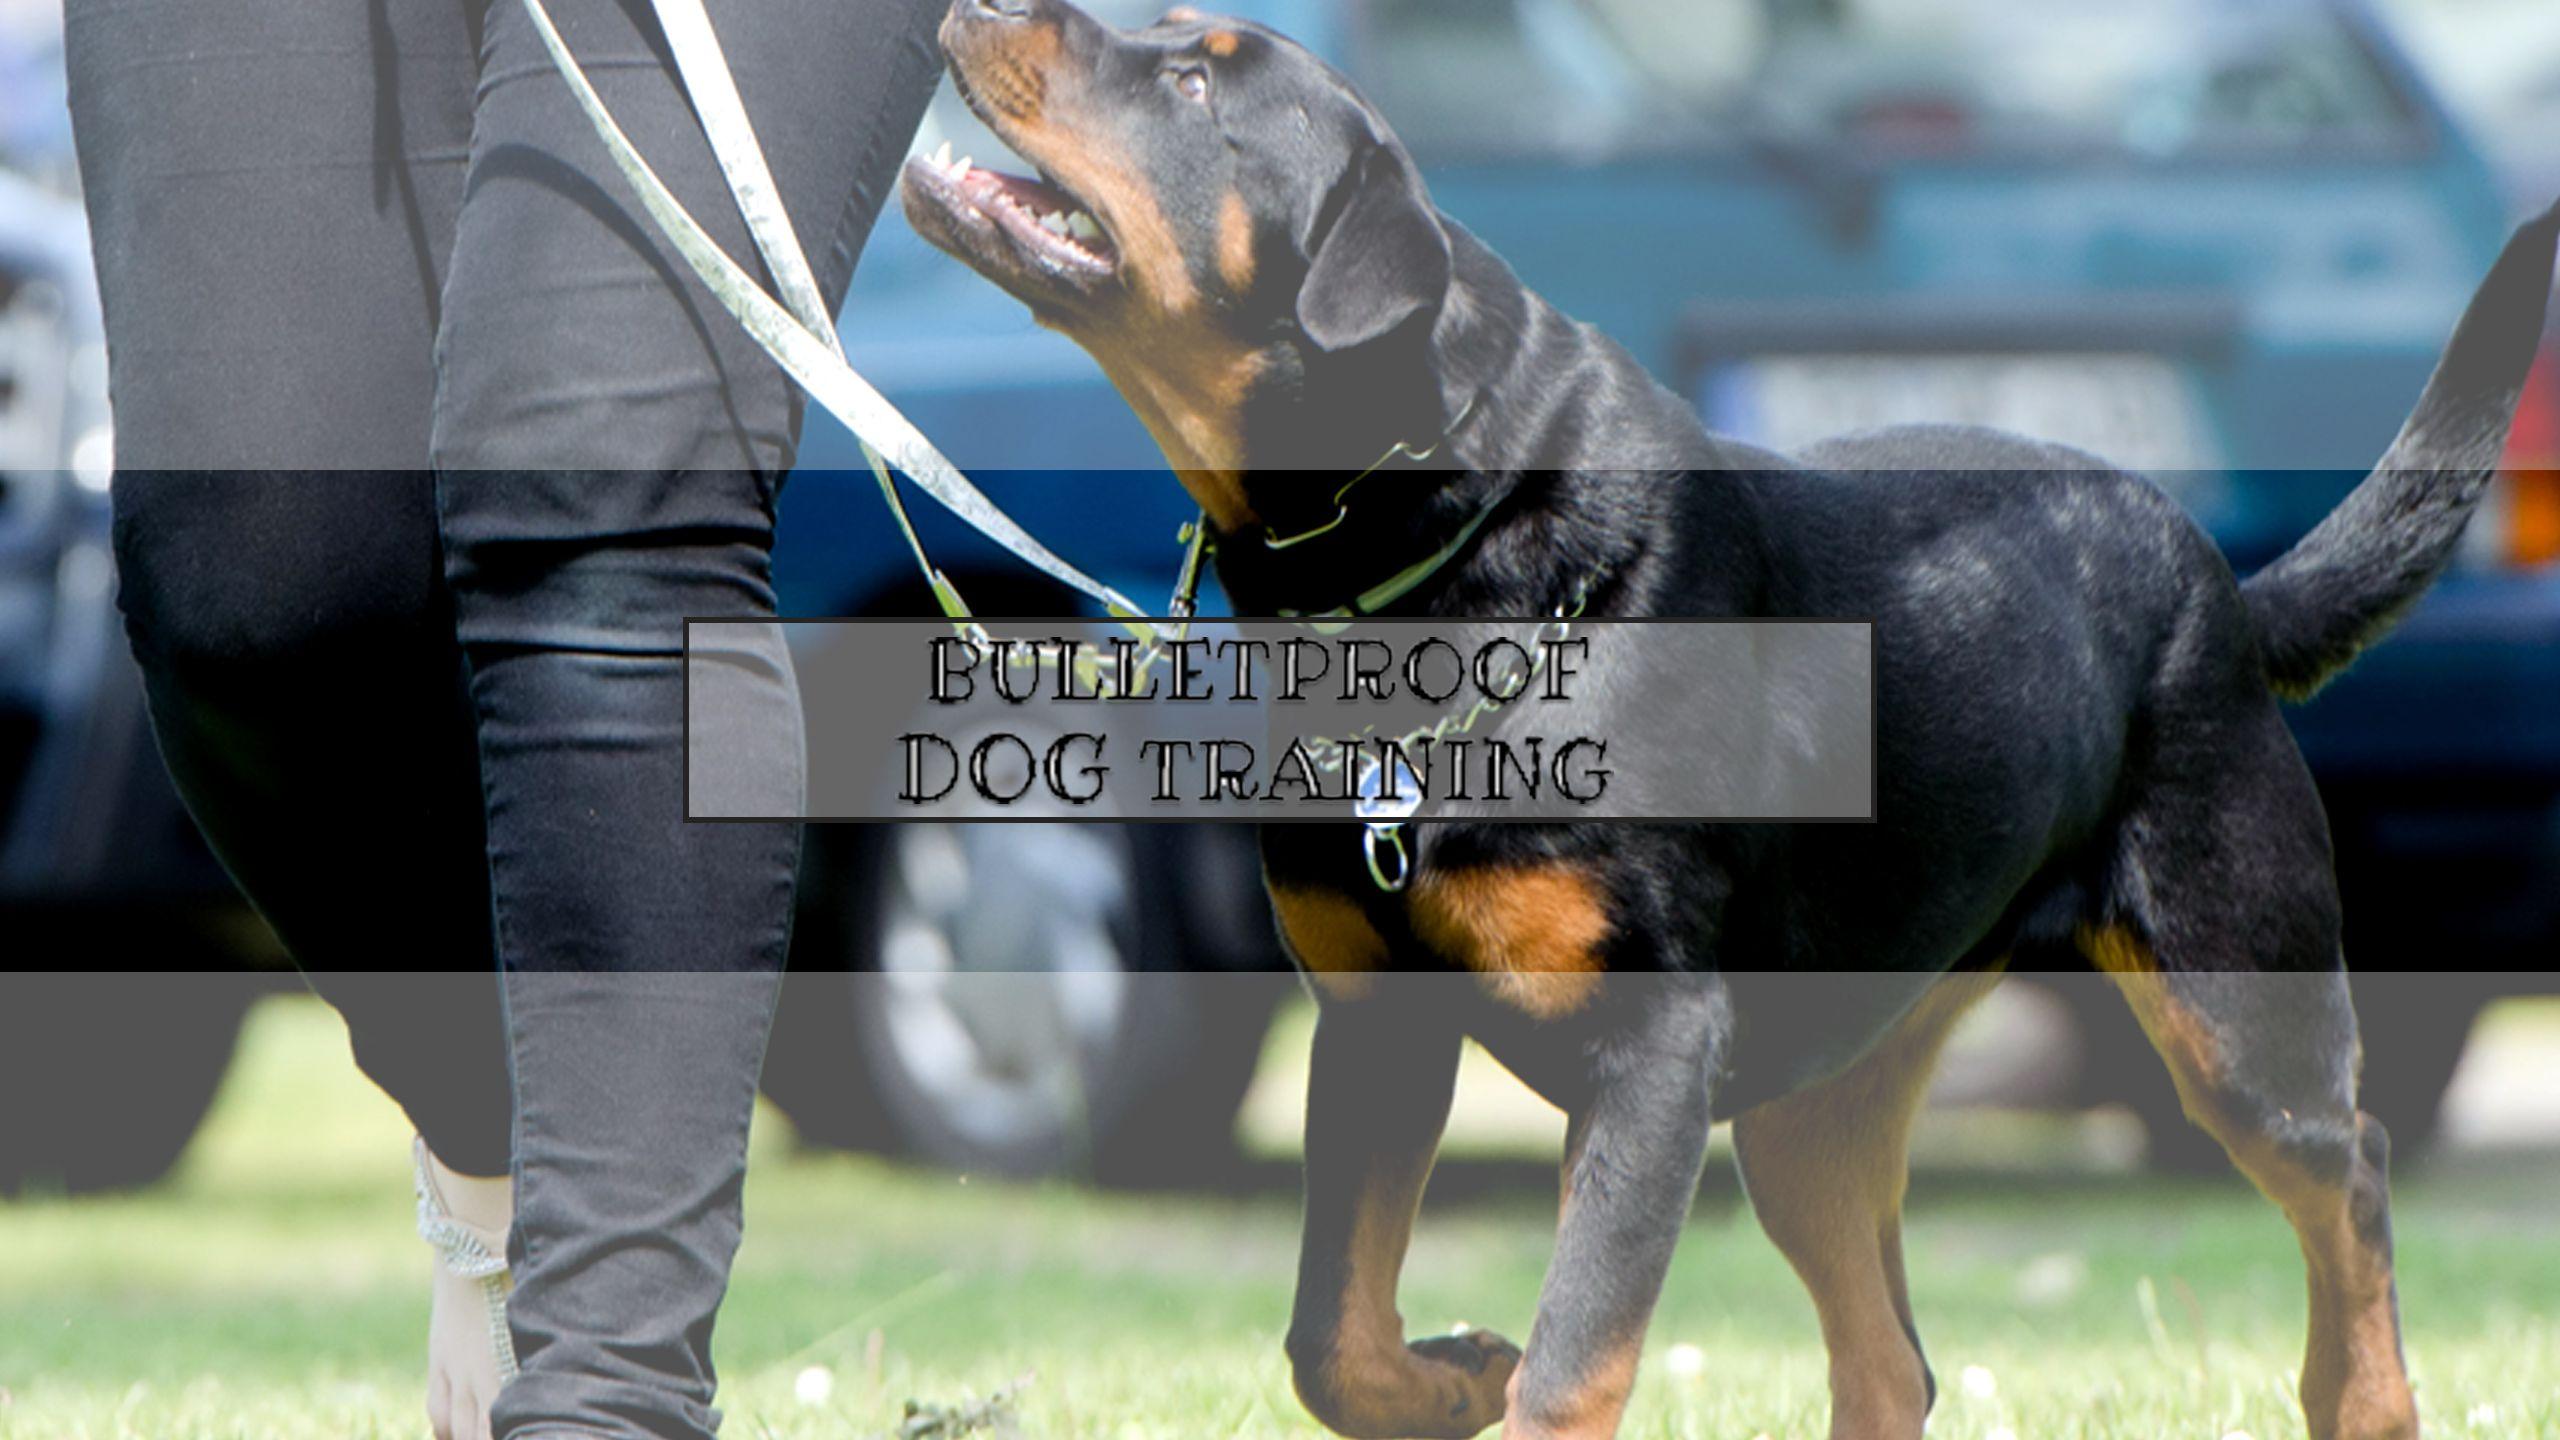 Bulletproof Dog Training Is A Dog Trainer In Cincinnati Oh We